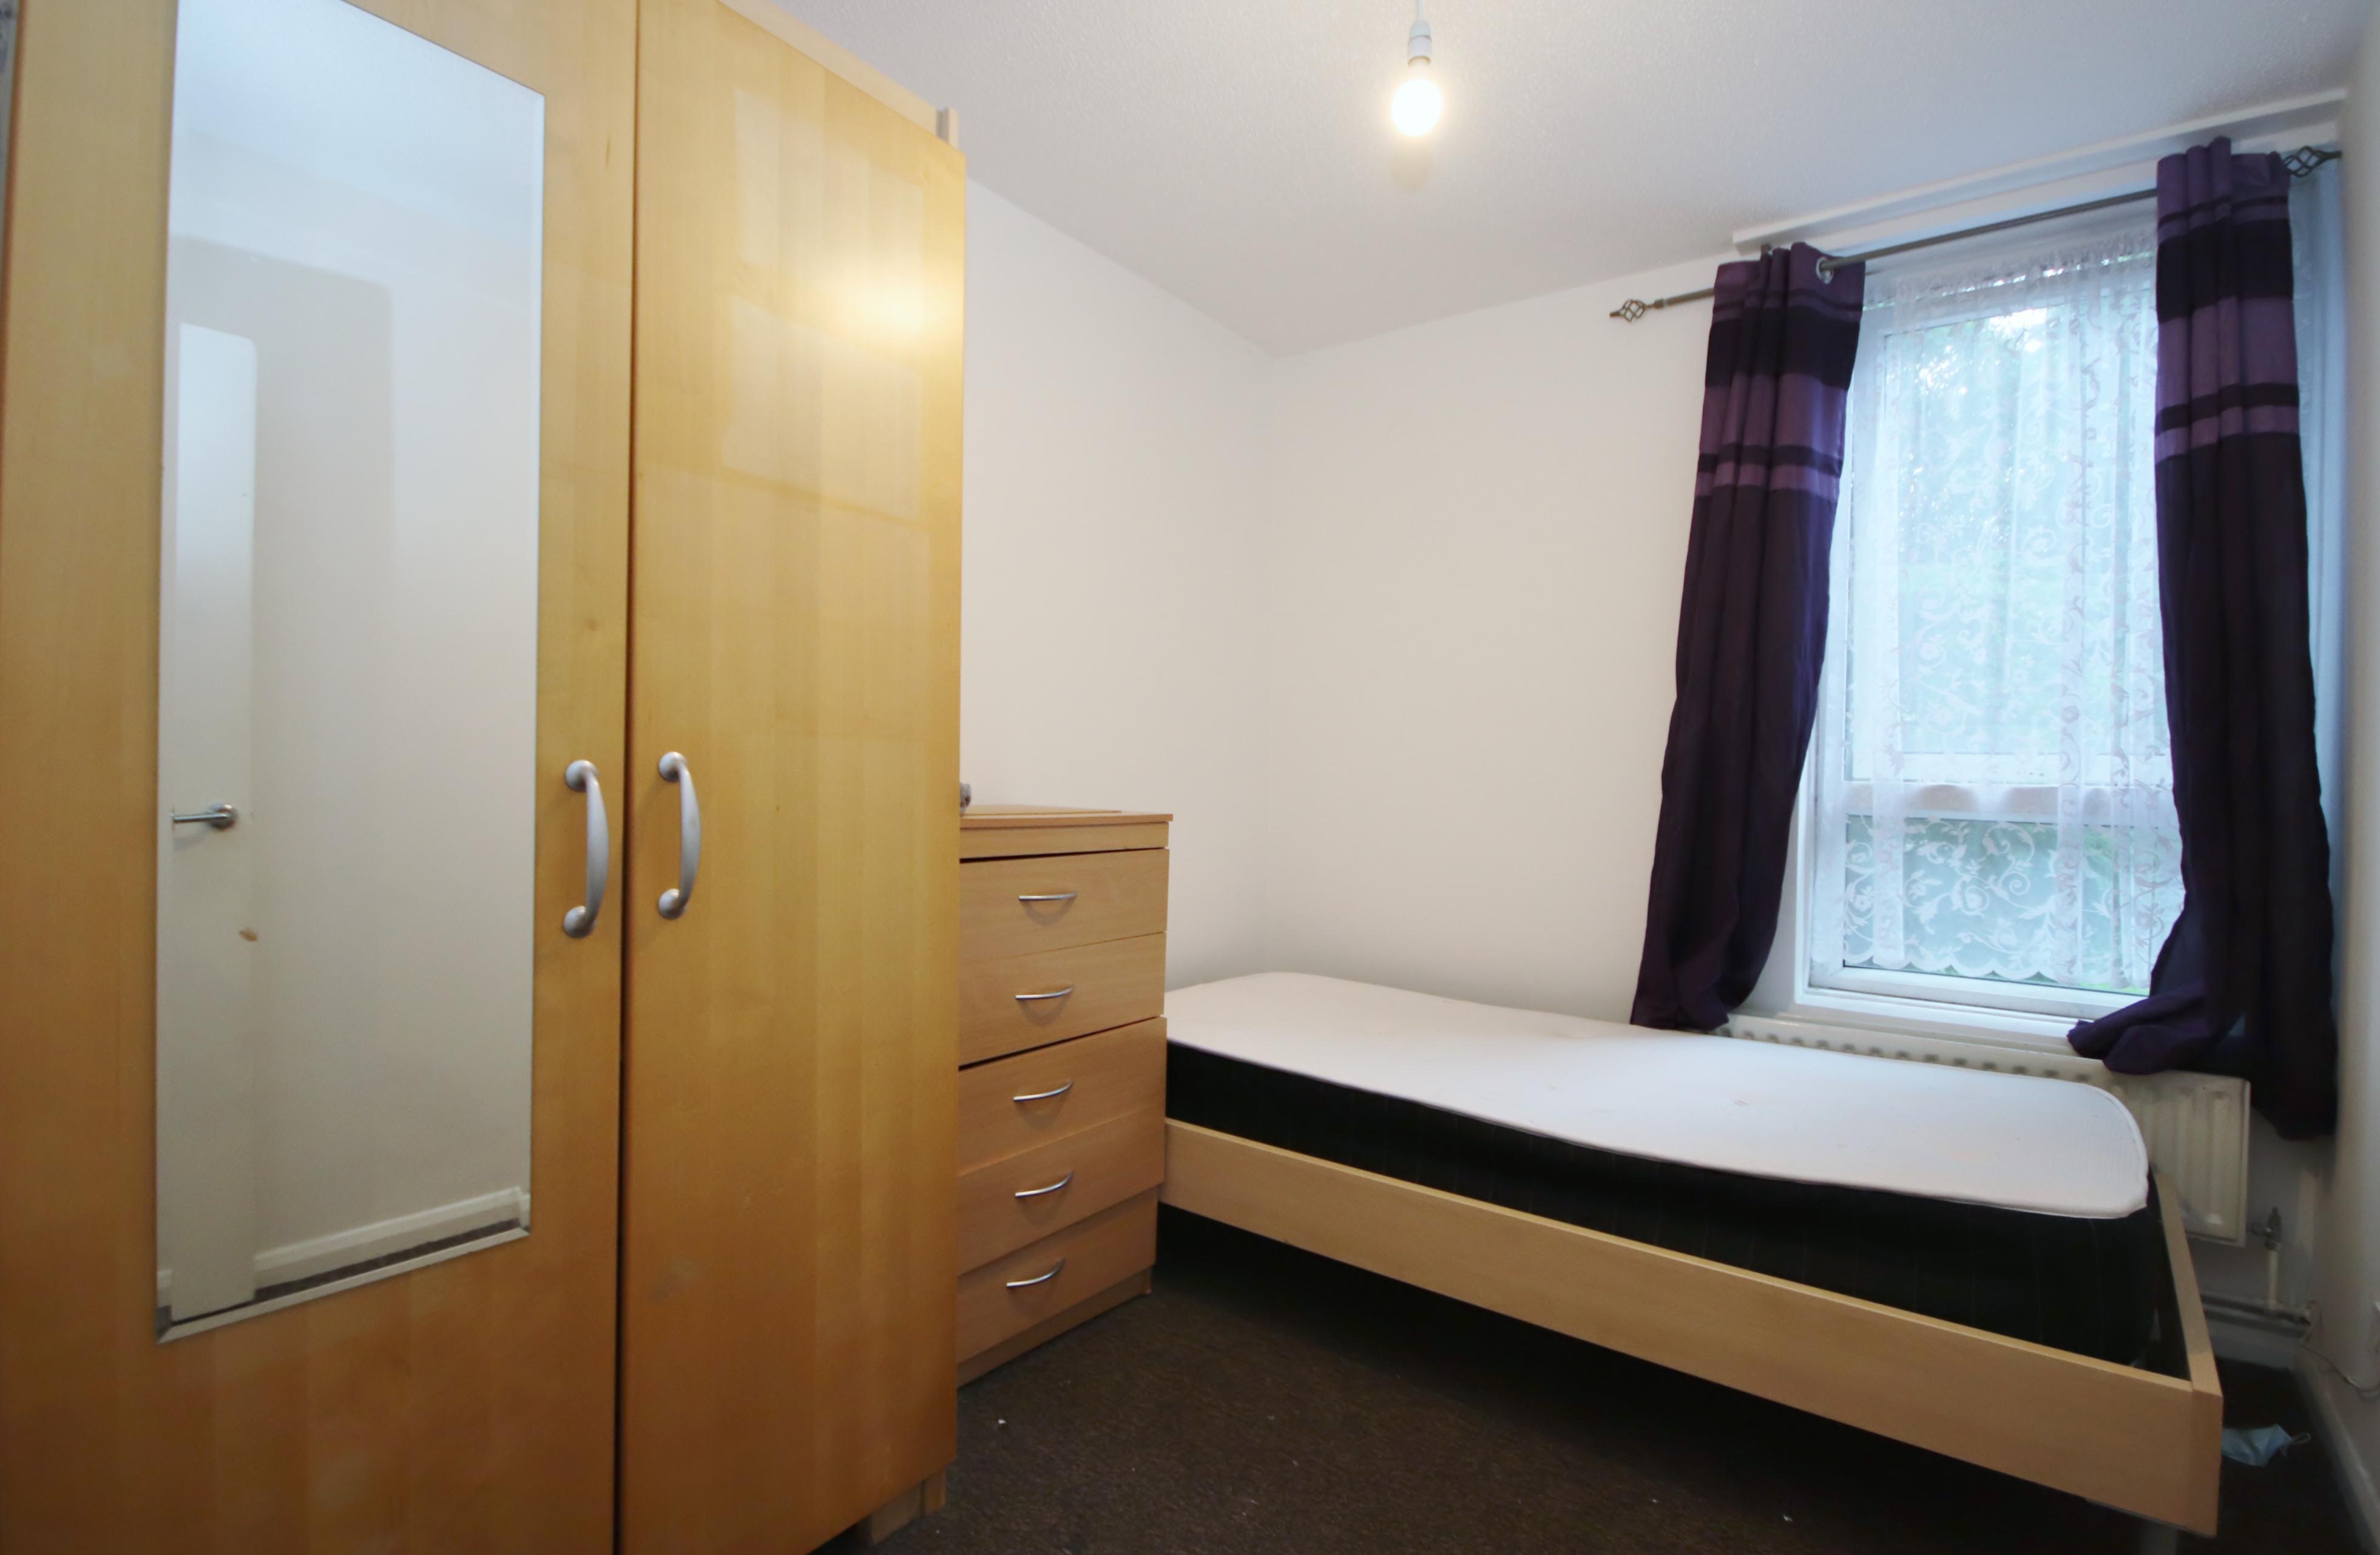 1 bed flat to rent in Pigott Street, E14